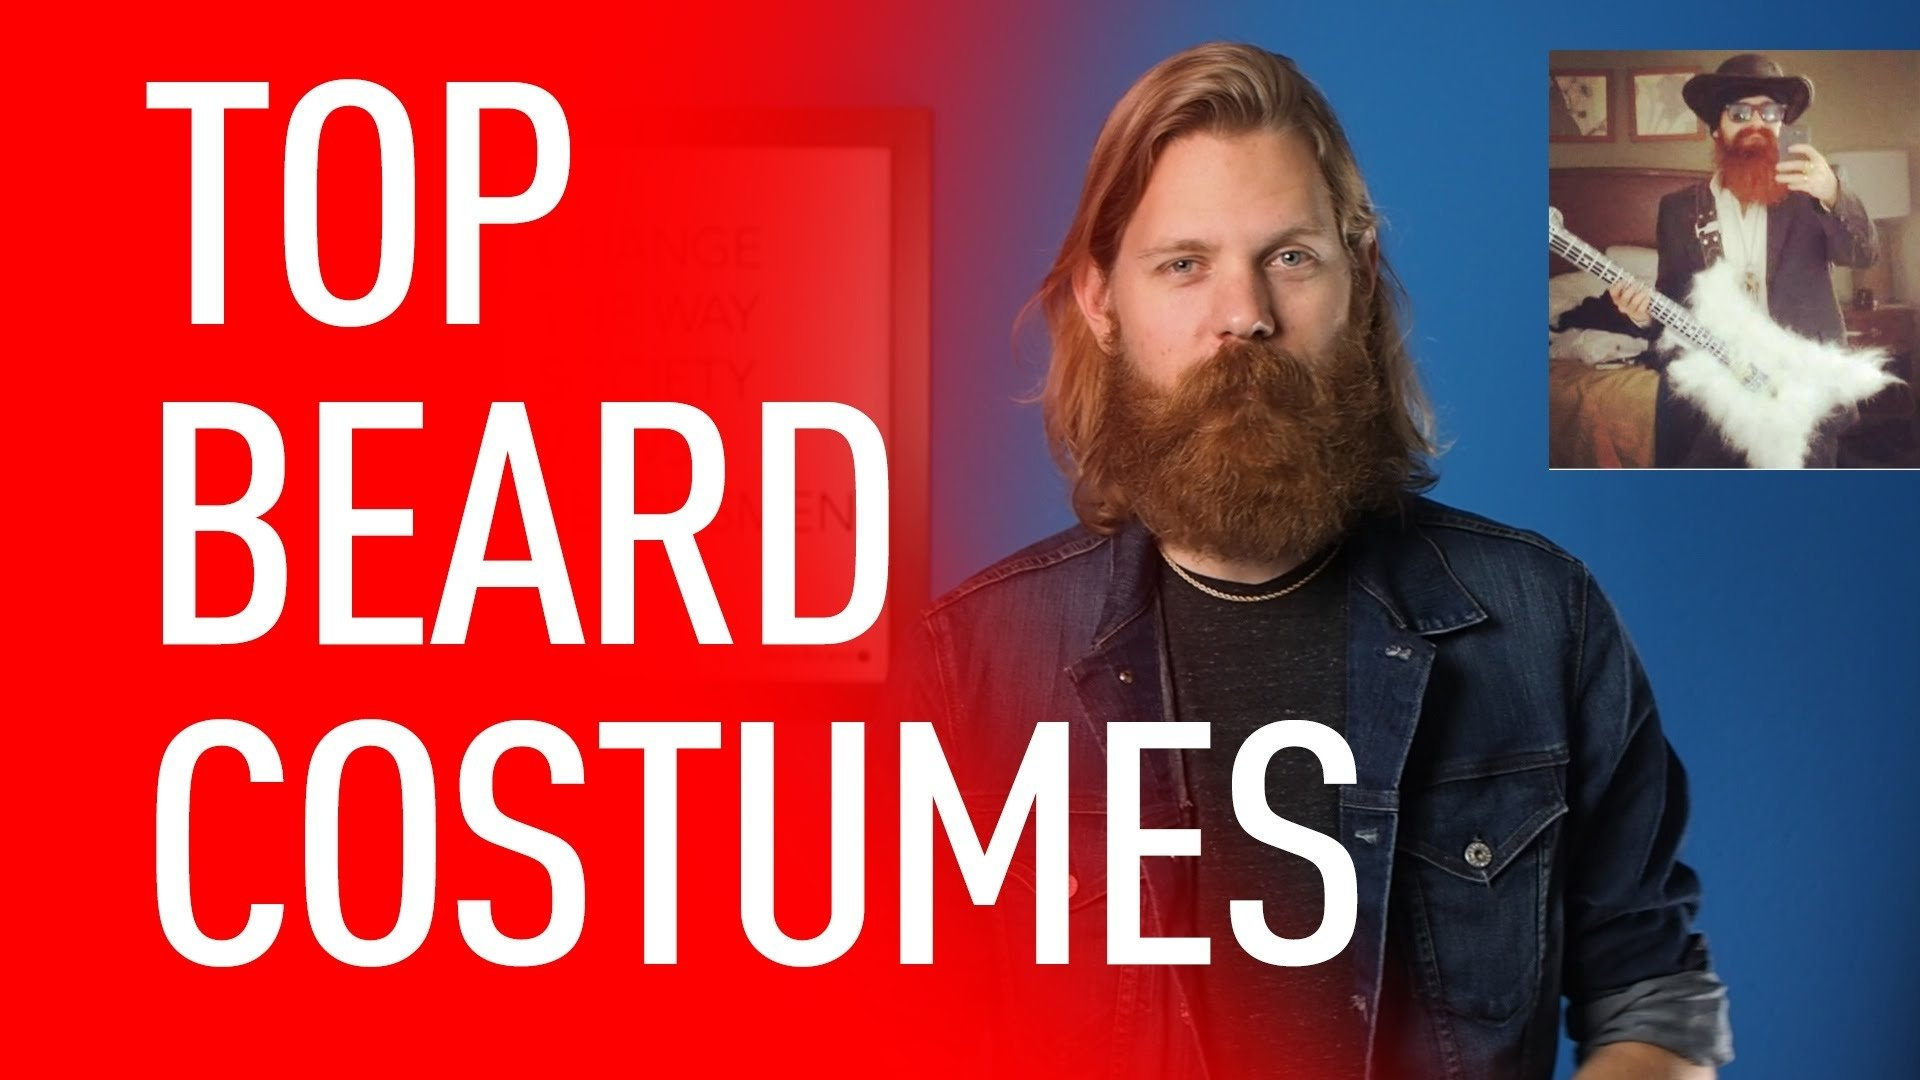 10 Unique Halloween Costume Ideas For Men With Beards ten best bearded halloween costumes eric bandholz youtube 1